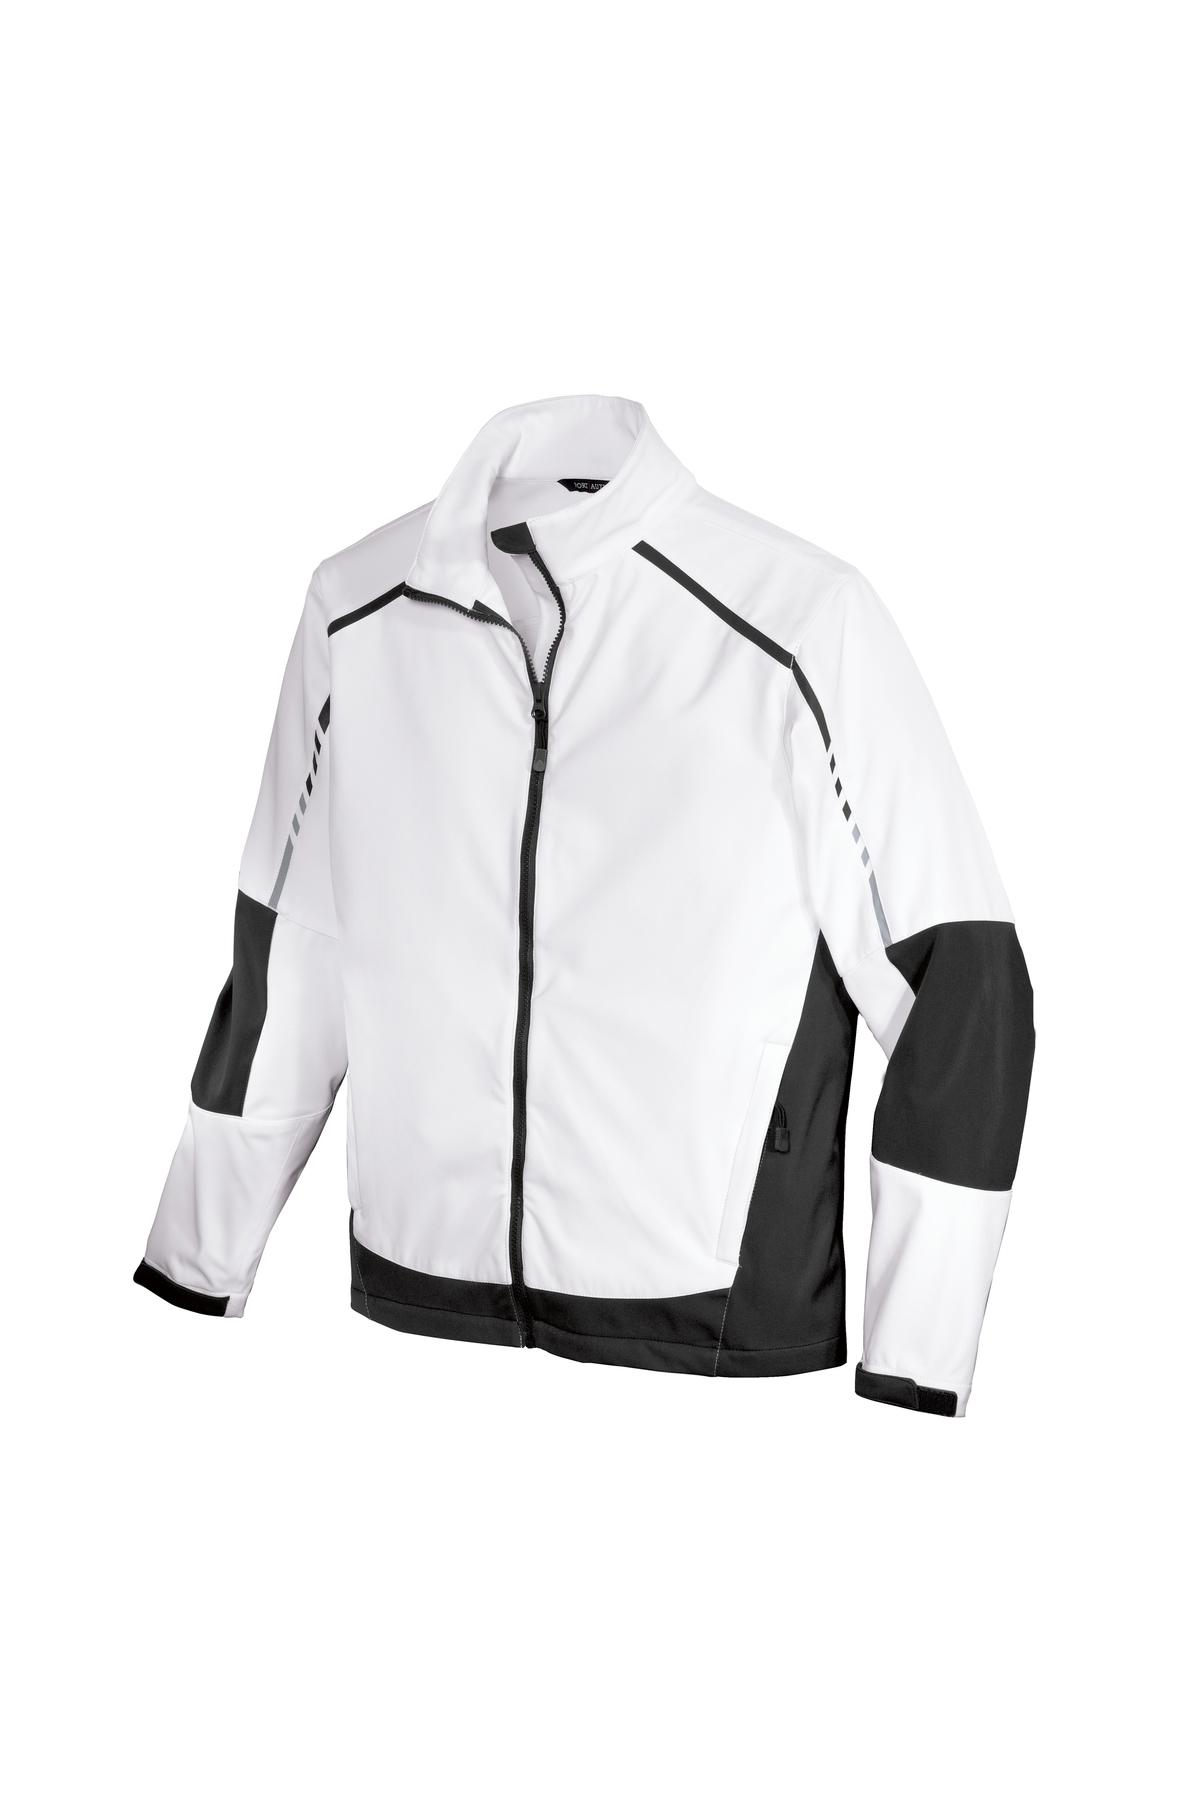 Port Authority J307 Embark Soft Shell Jacket